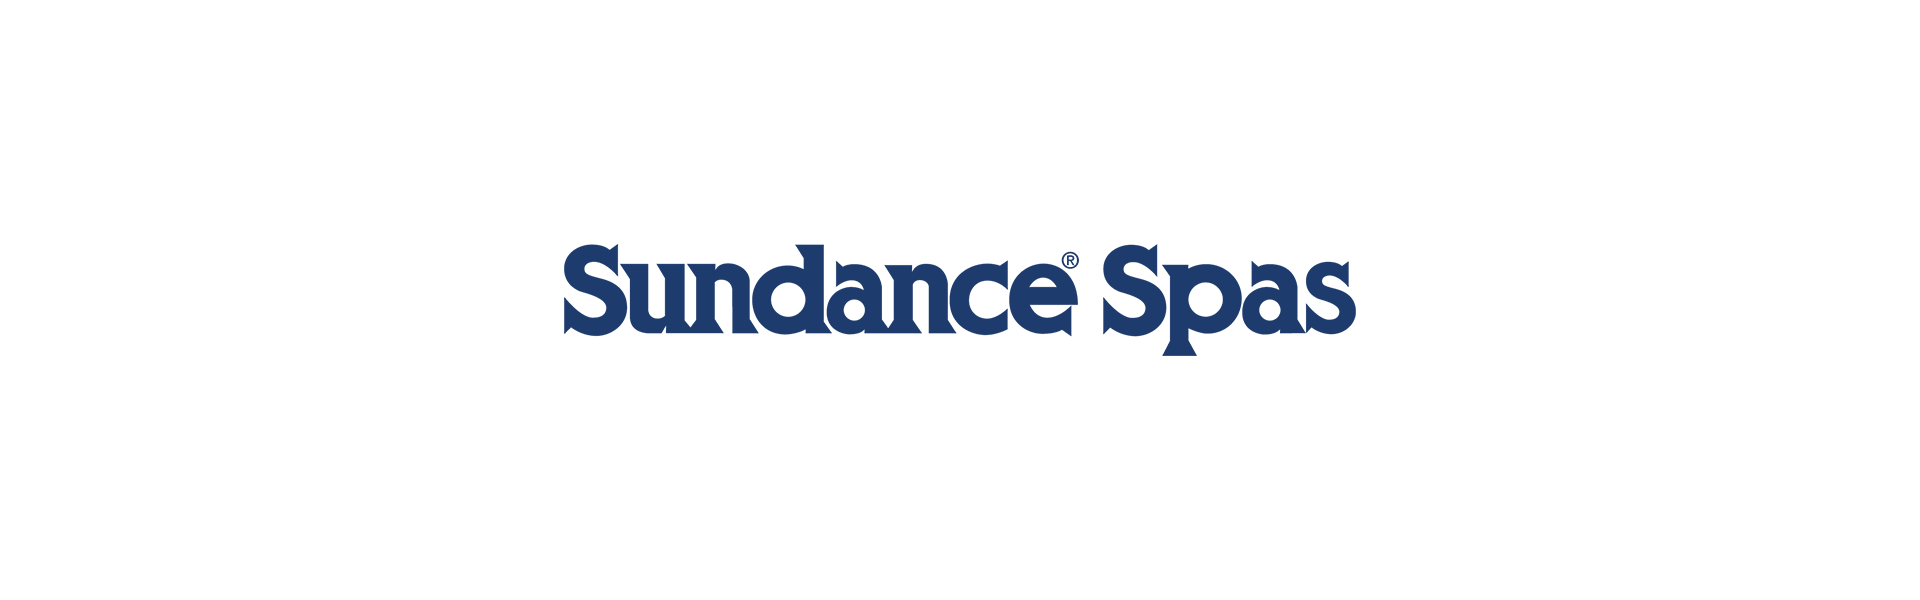 sundacne-title-logo2